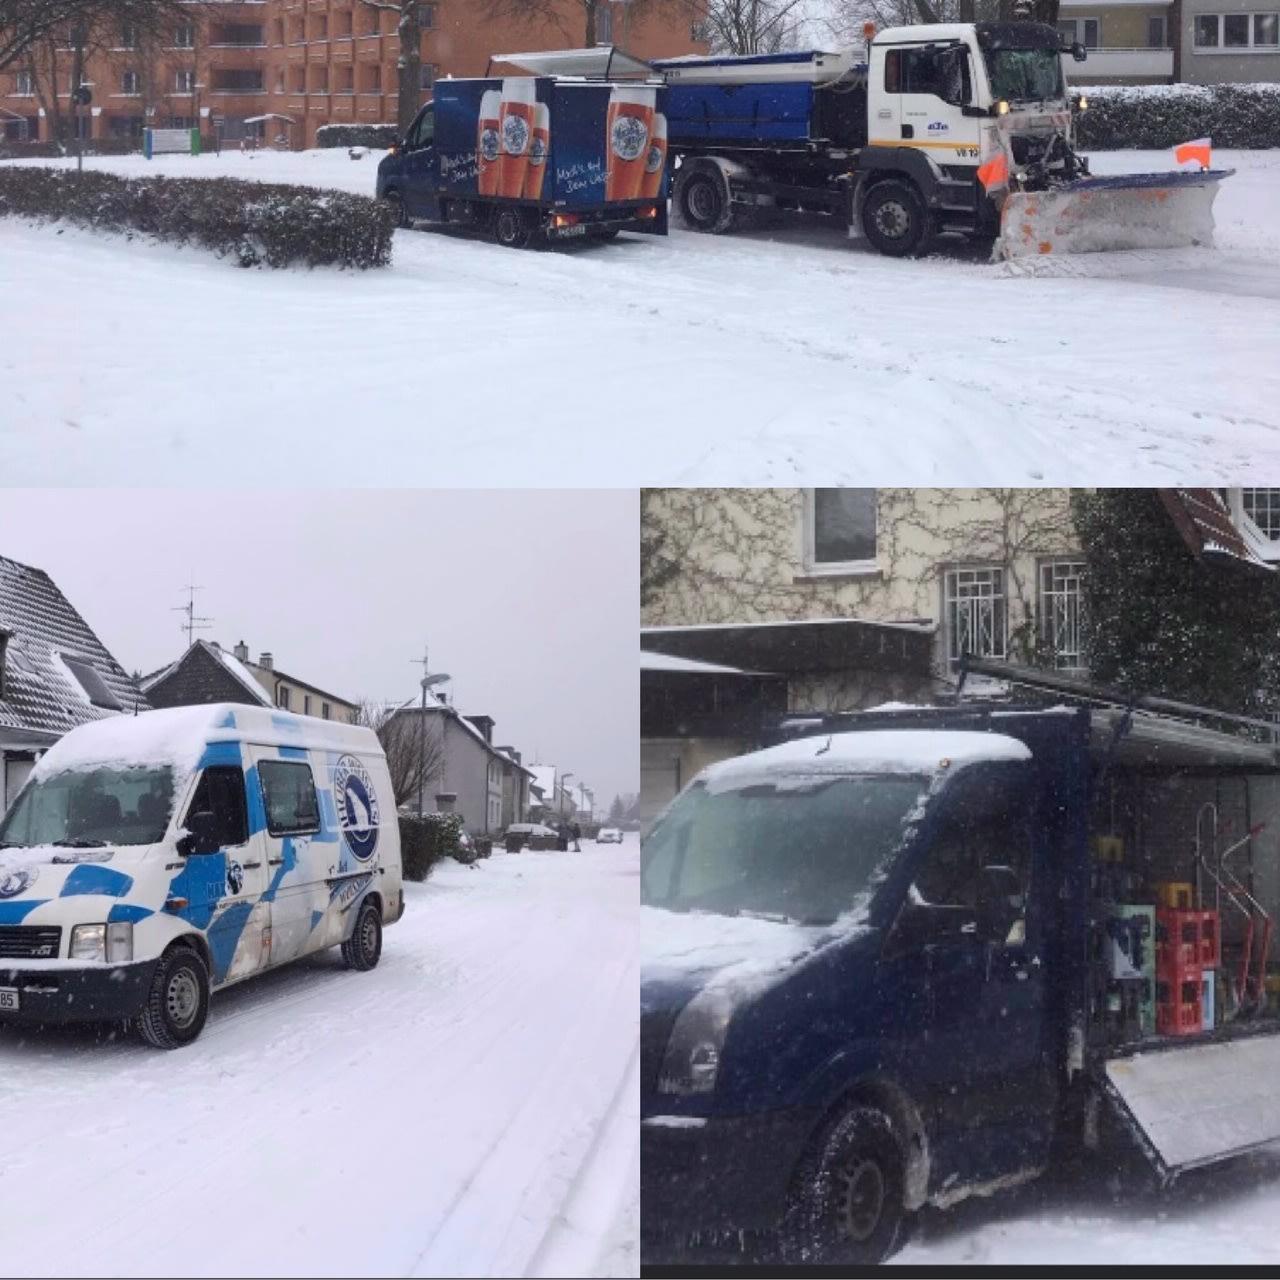 Getraenke Hax liefert im Winter